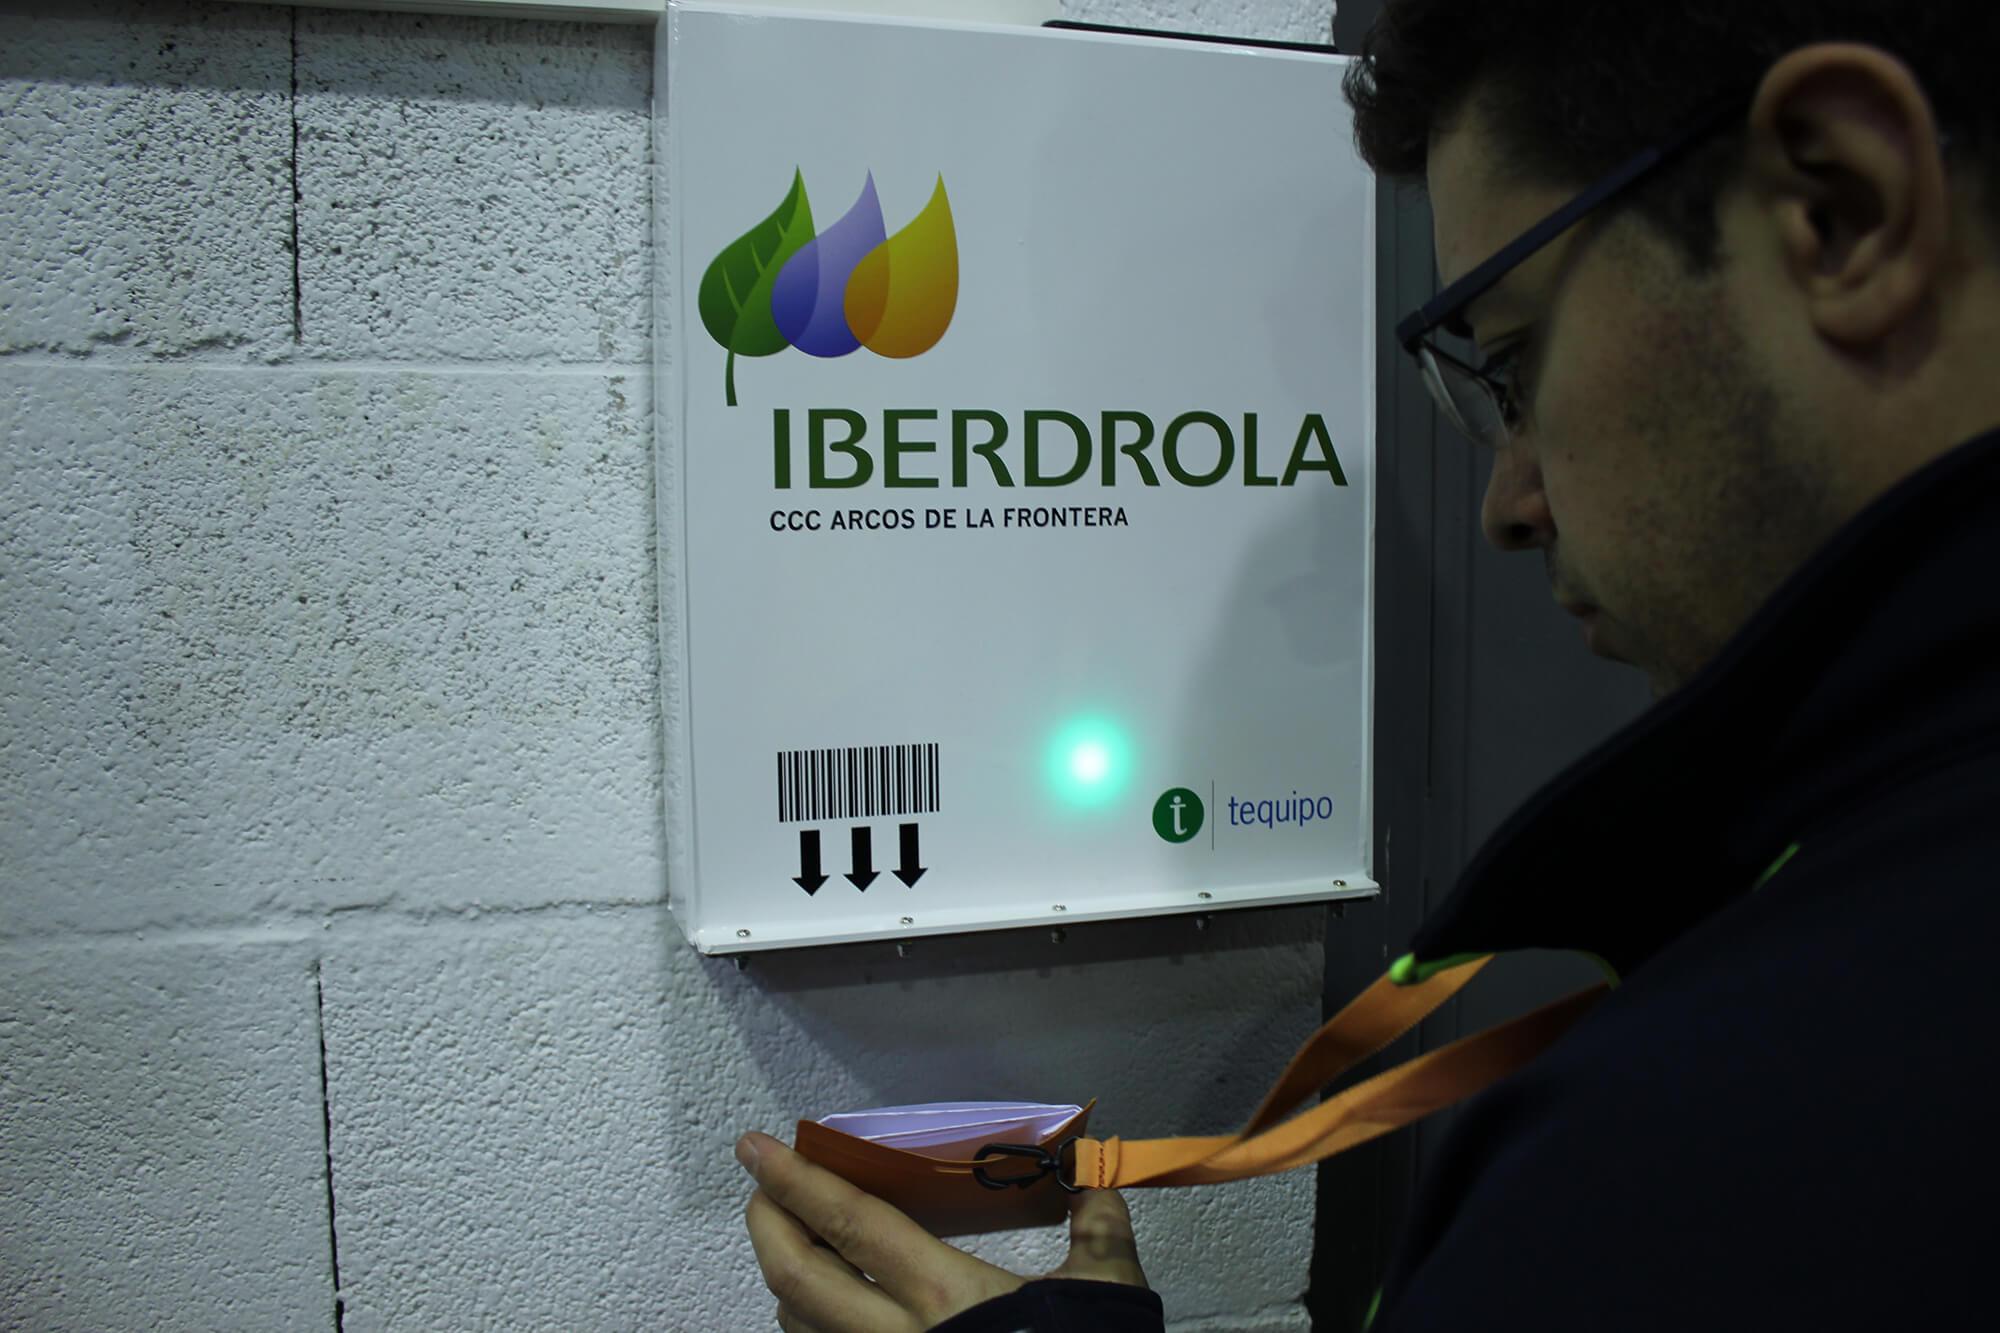 Control de acceso Iberdrola